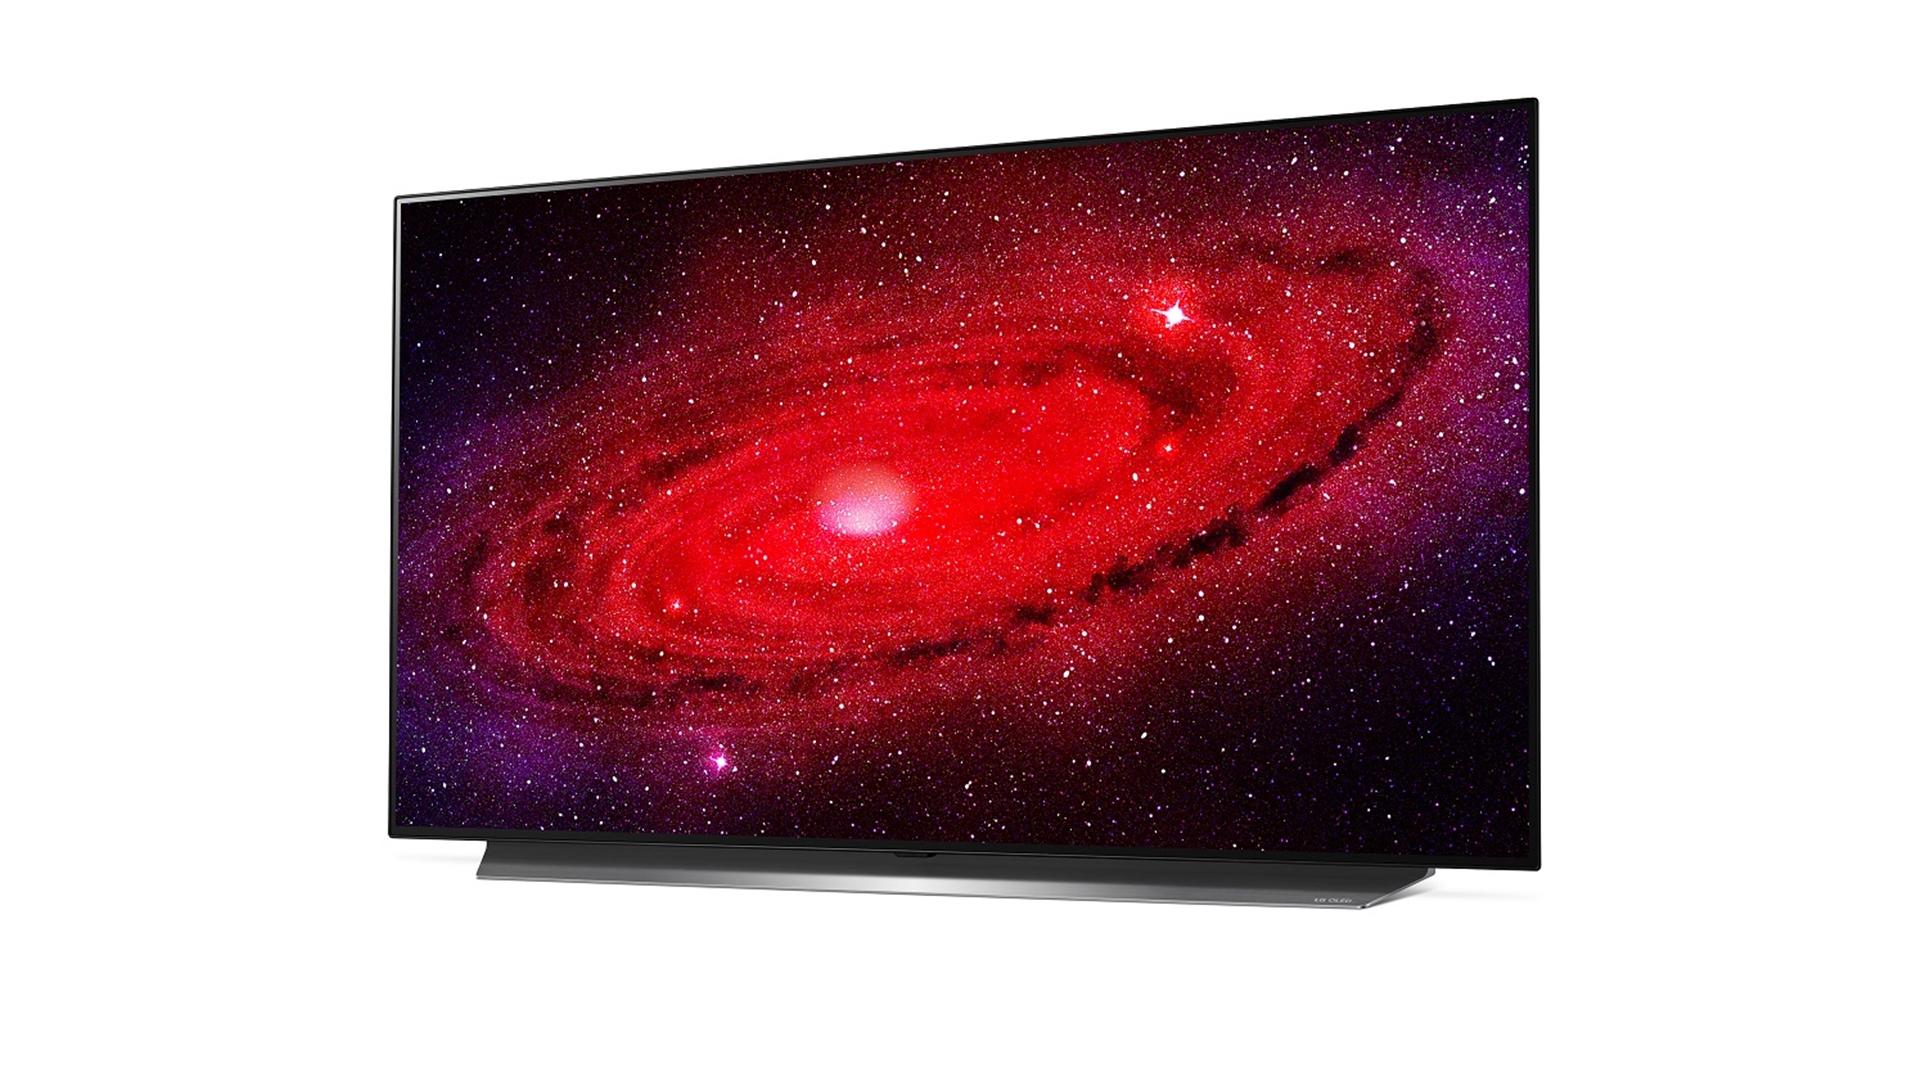 48형 LG 올레드 TV(모델명: 48CX) 제품 이미지